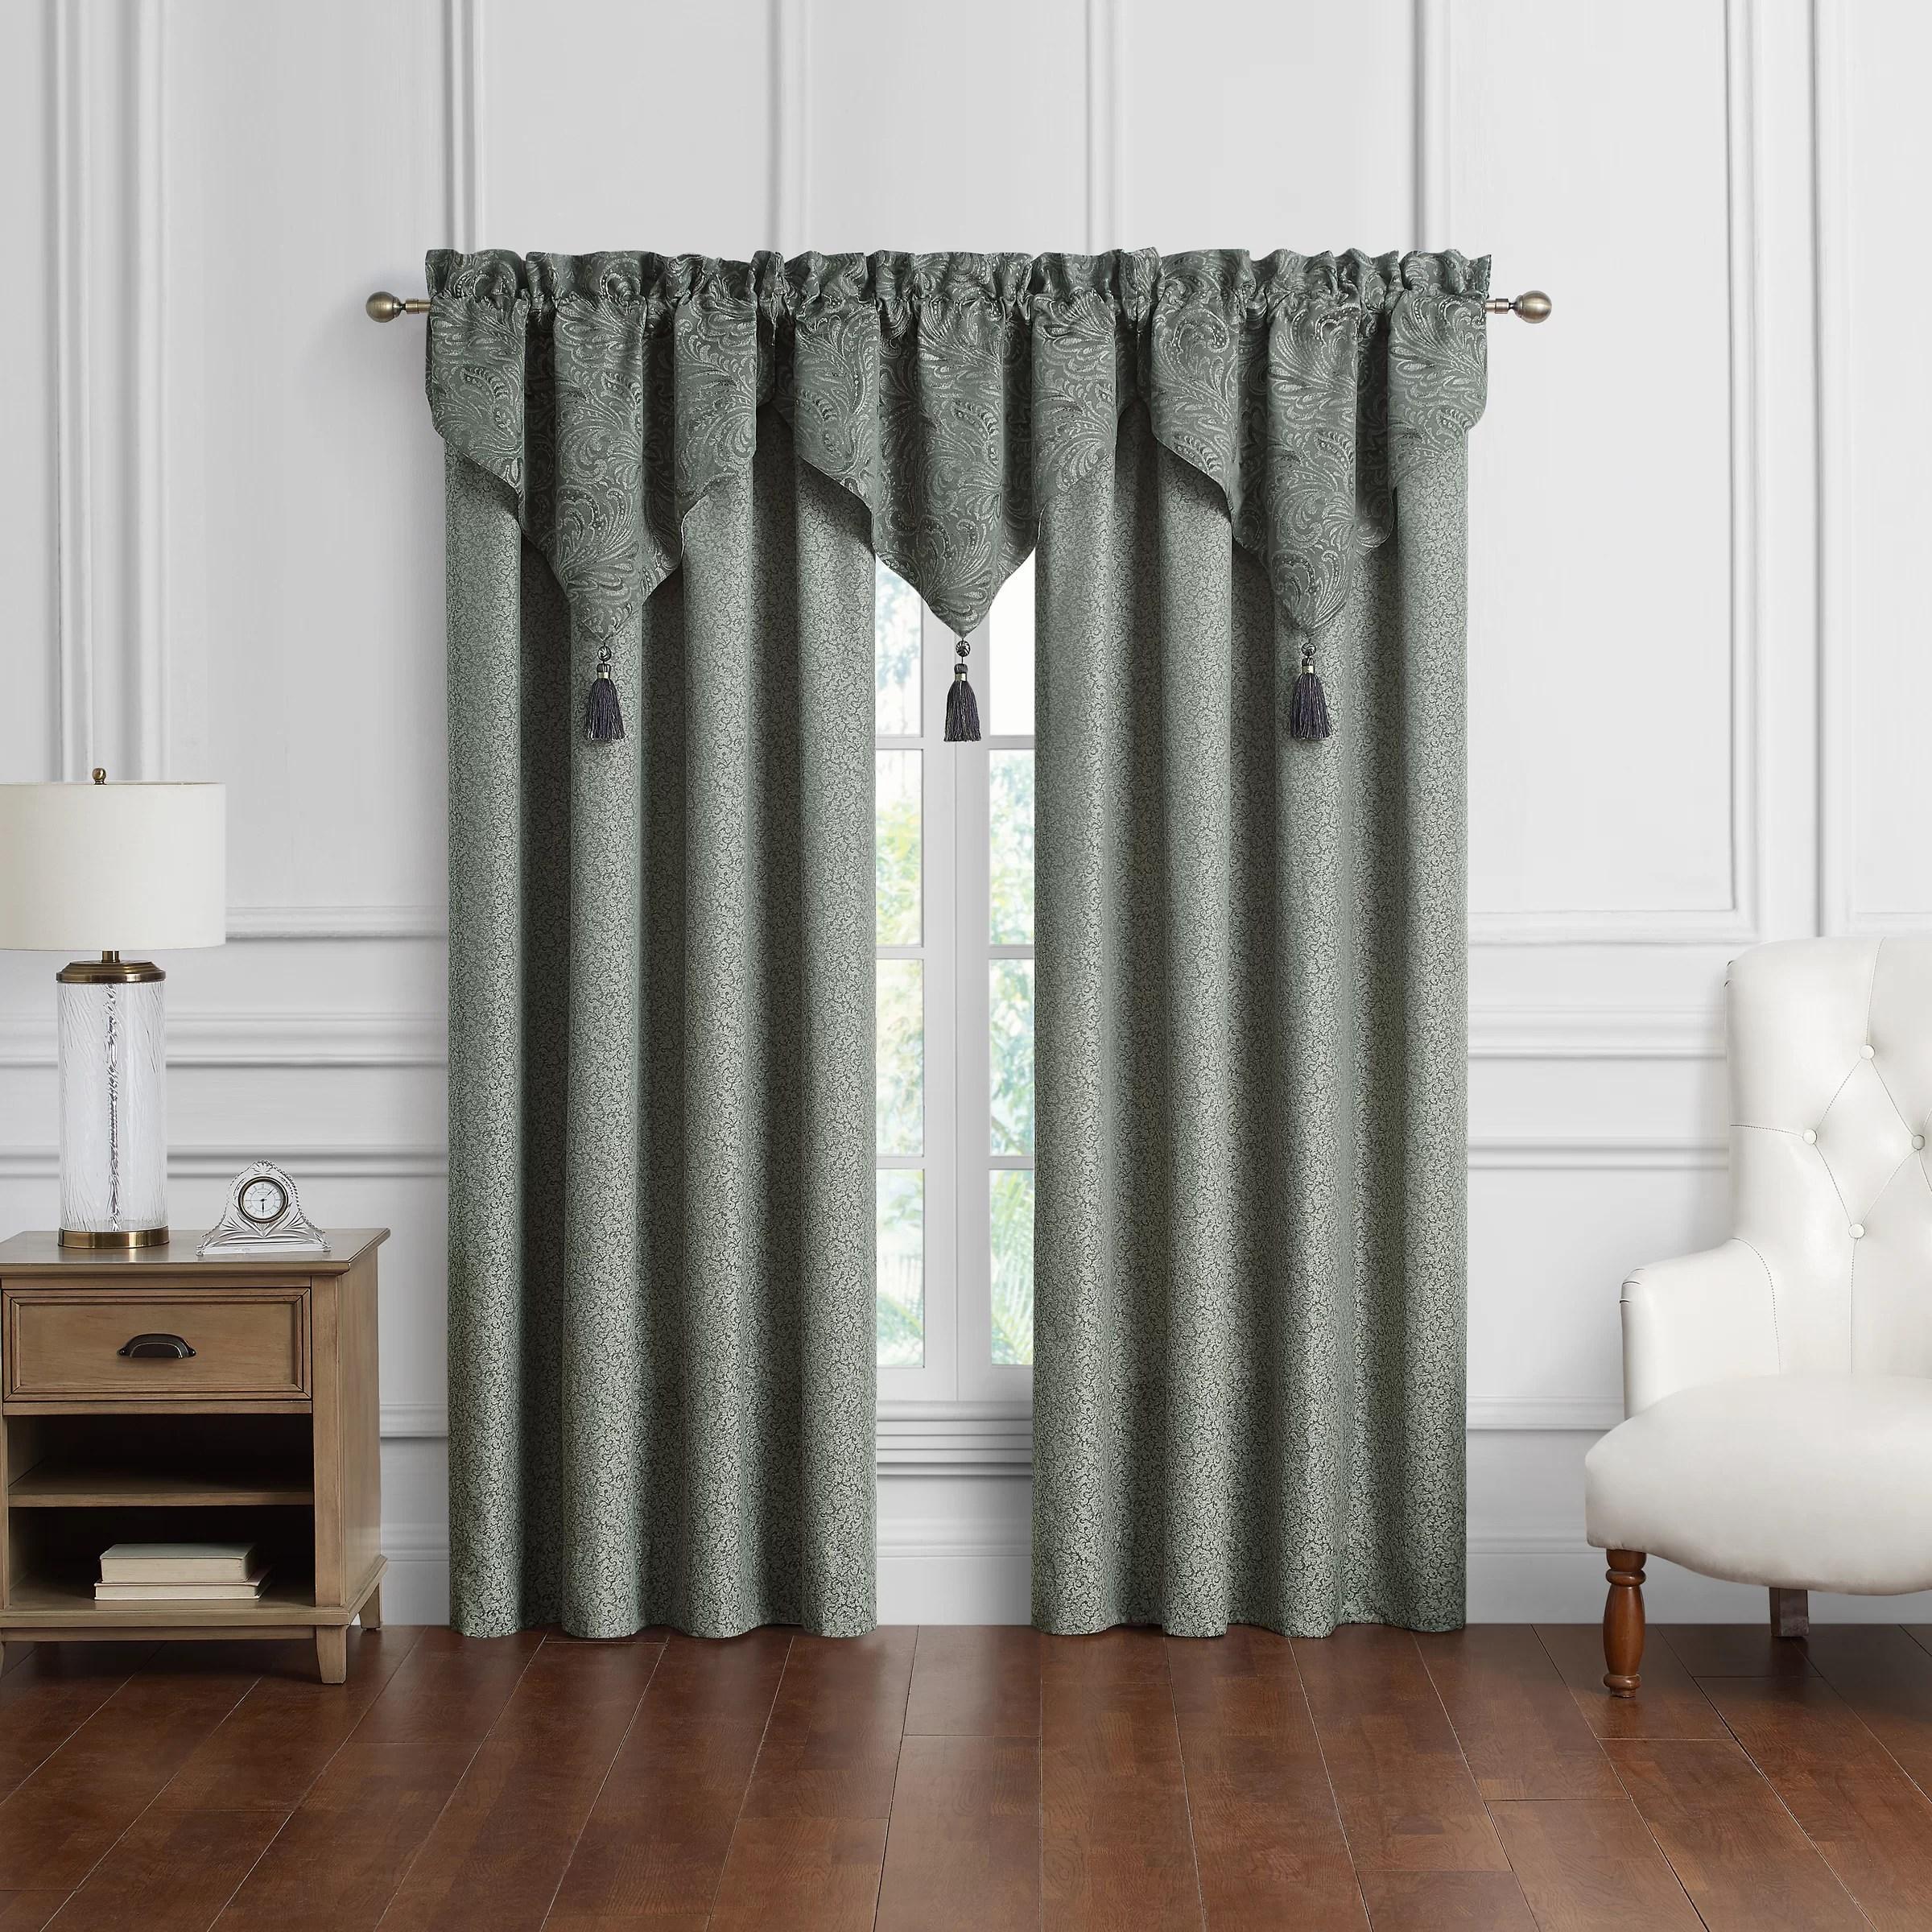 garner set of 2 rod pocket curtain panels